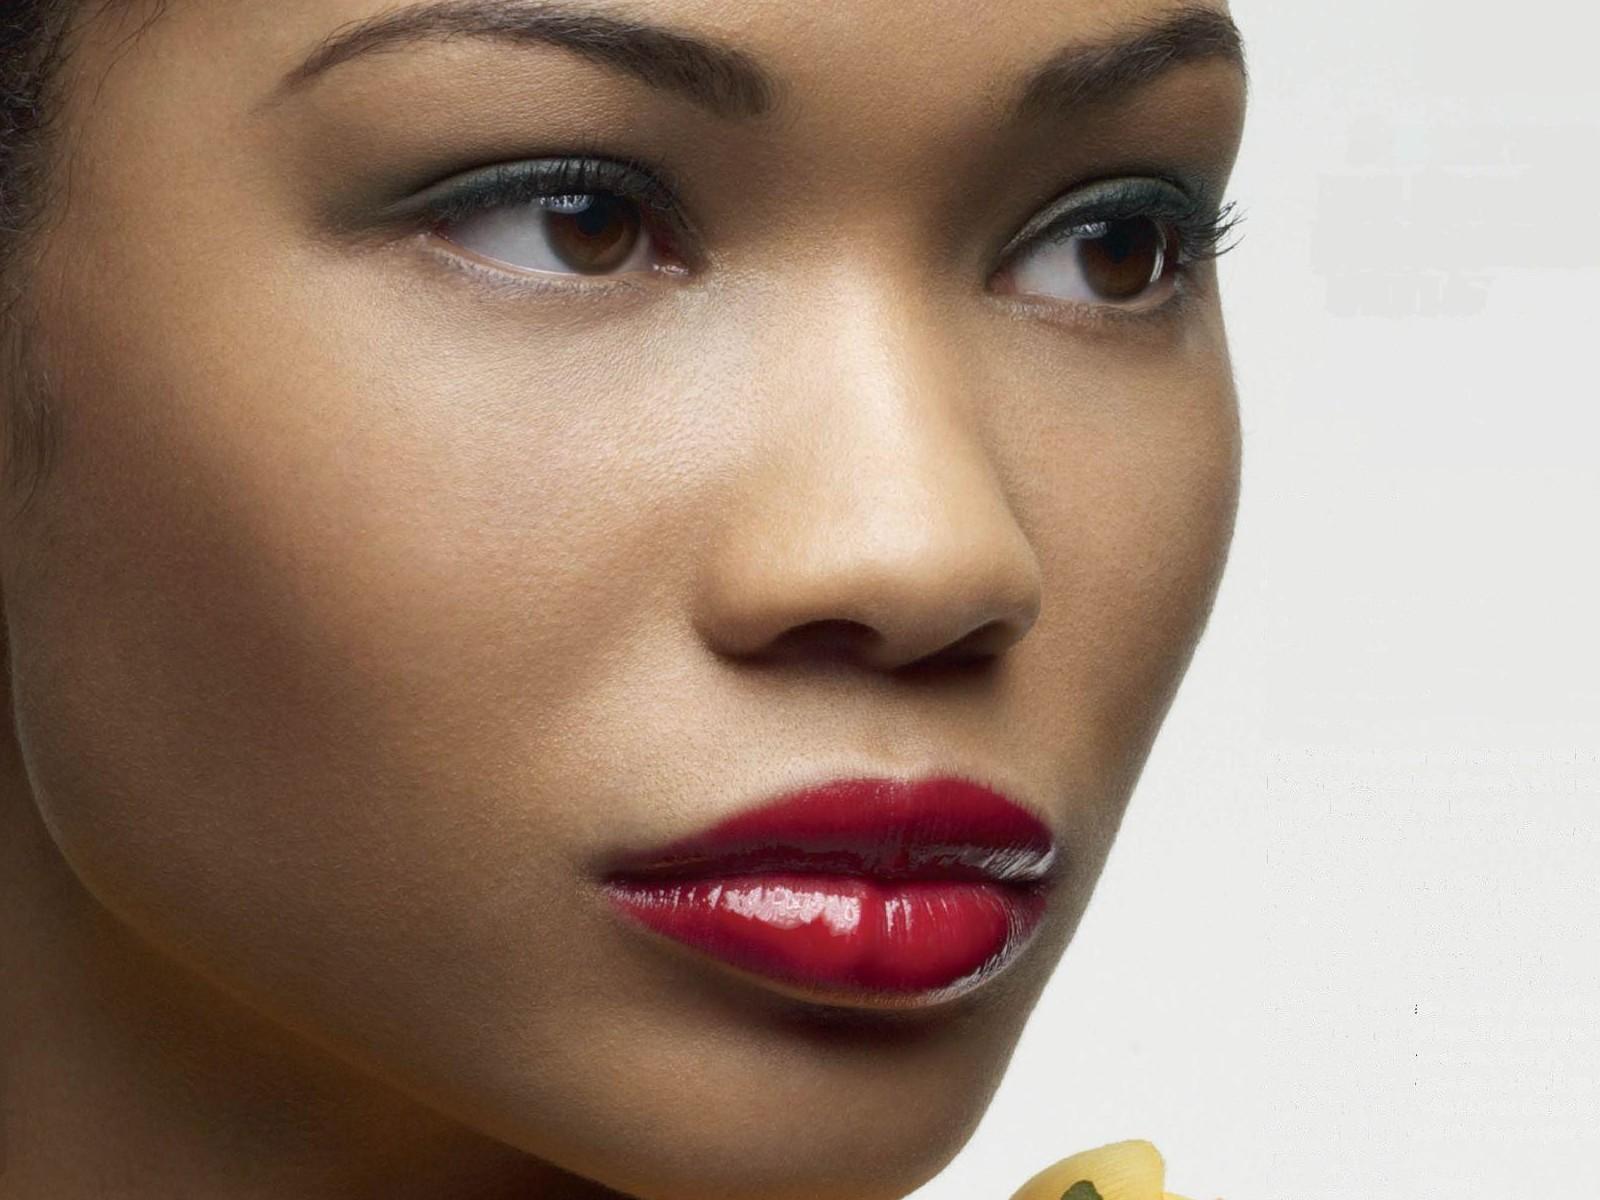 Chanel Iman Widescreen